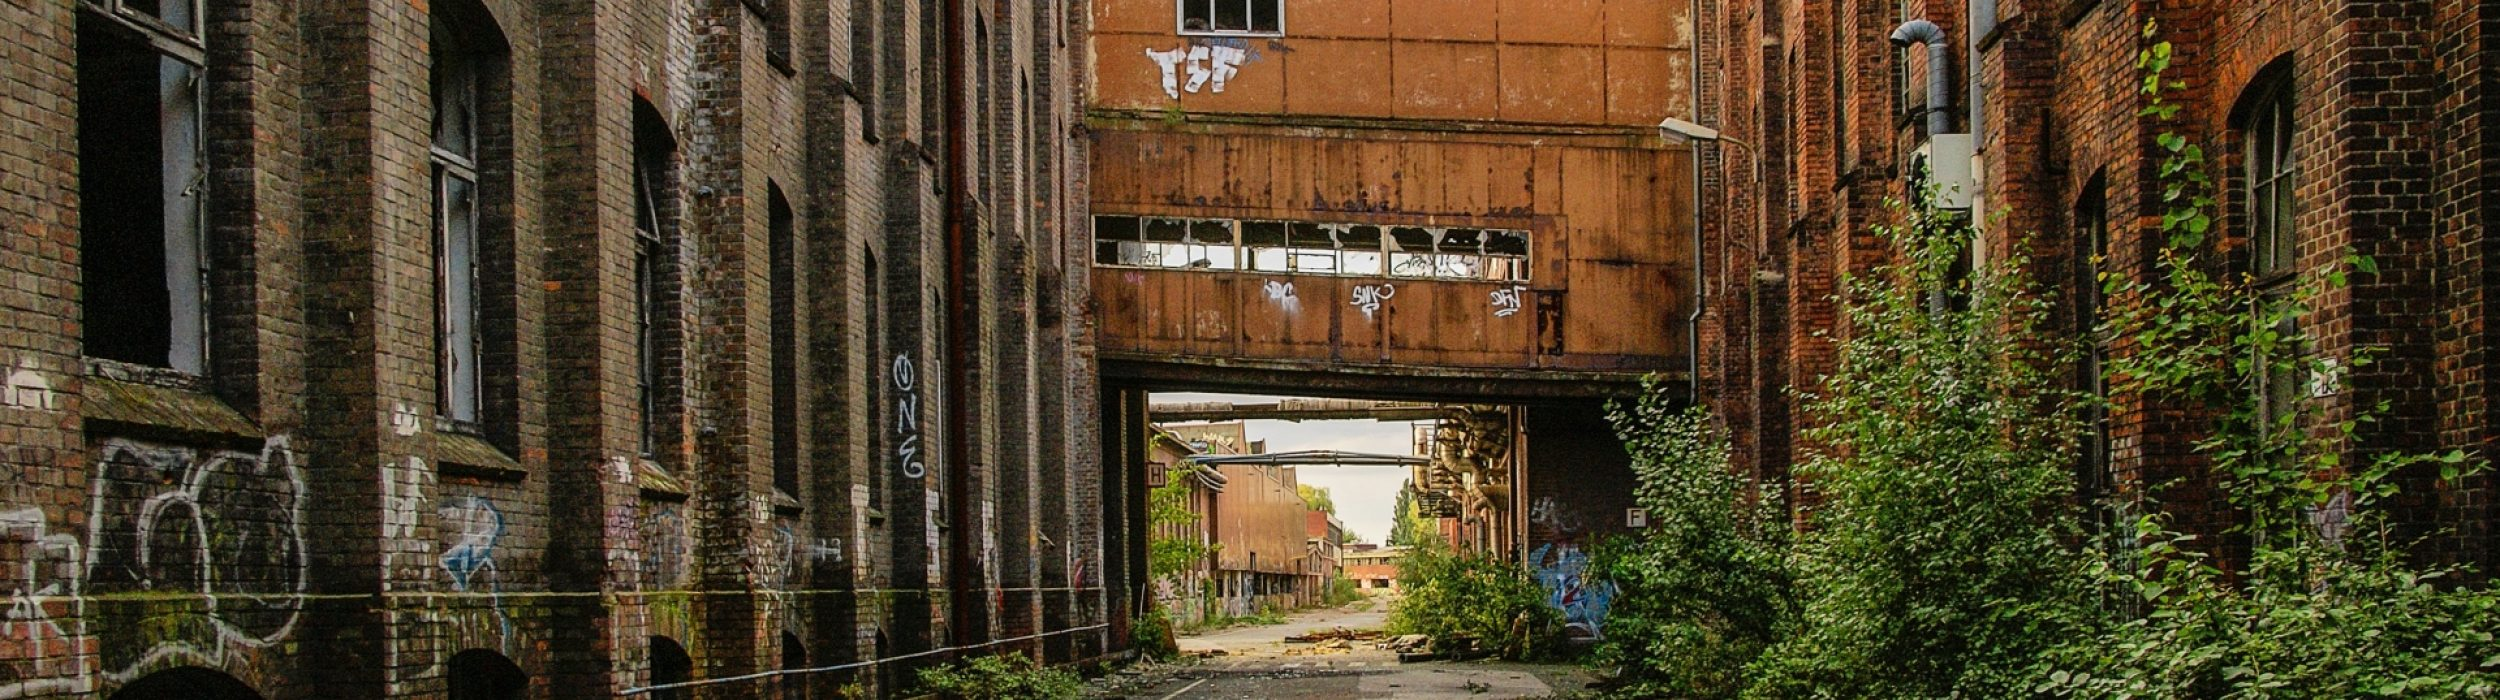 abandoned-factory-in-hanover-232-medium